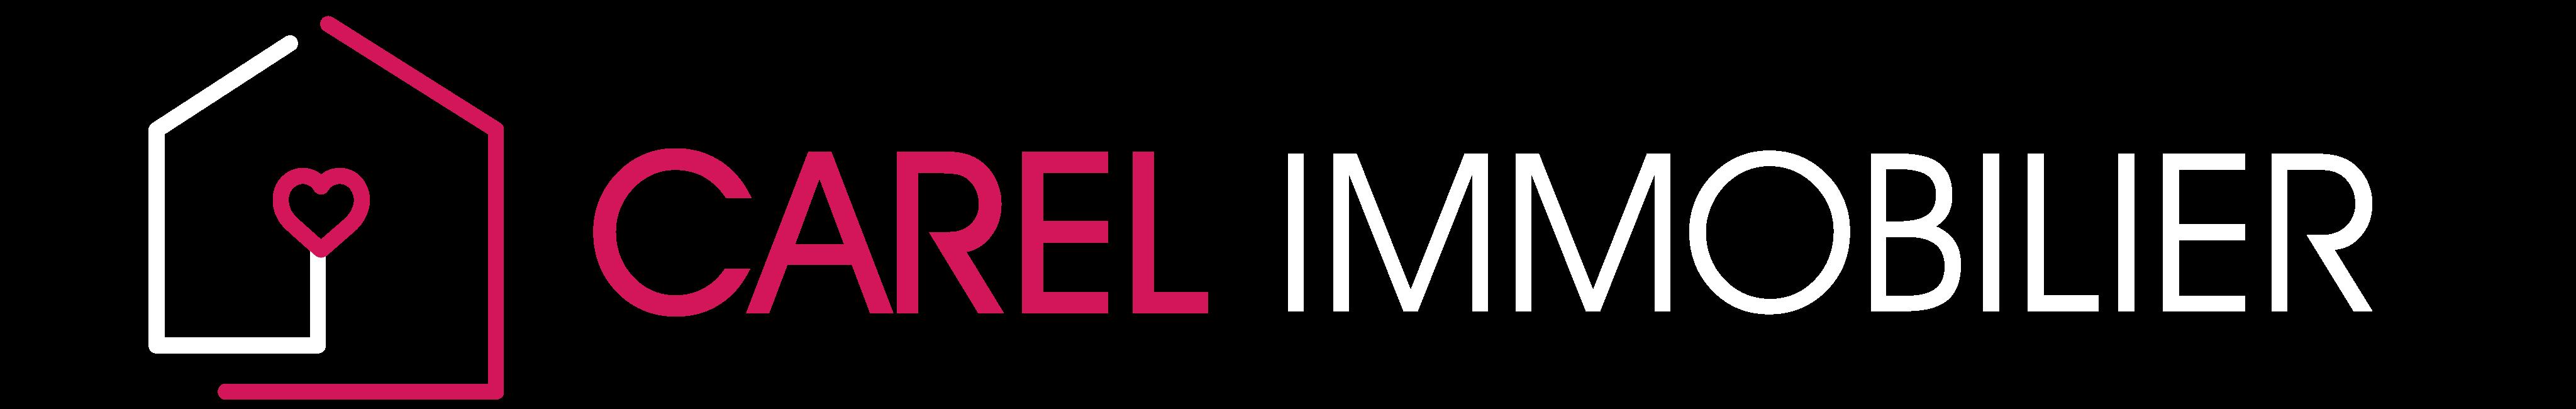 CAREL IMMOBILIER